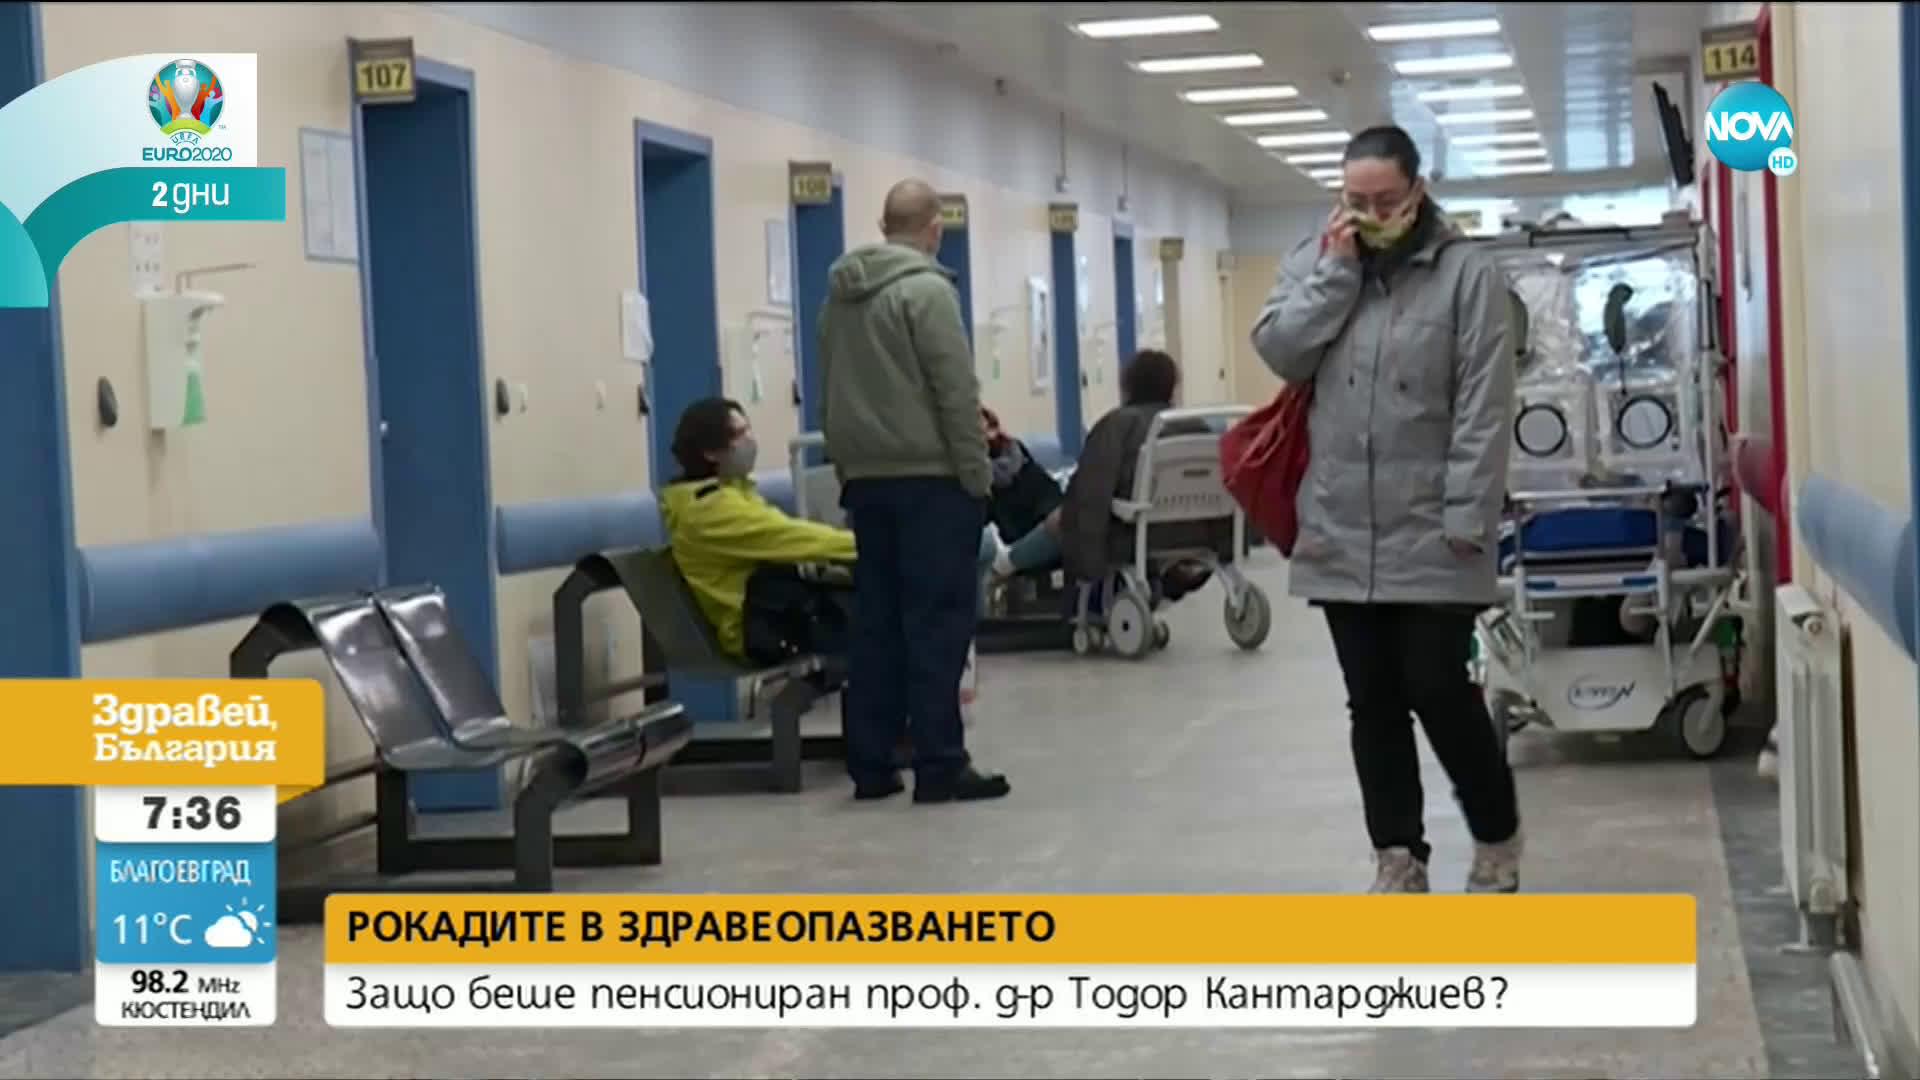 Проф. Кантарджиев: Пенсионирането ми беше самоцел с лични мотиви